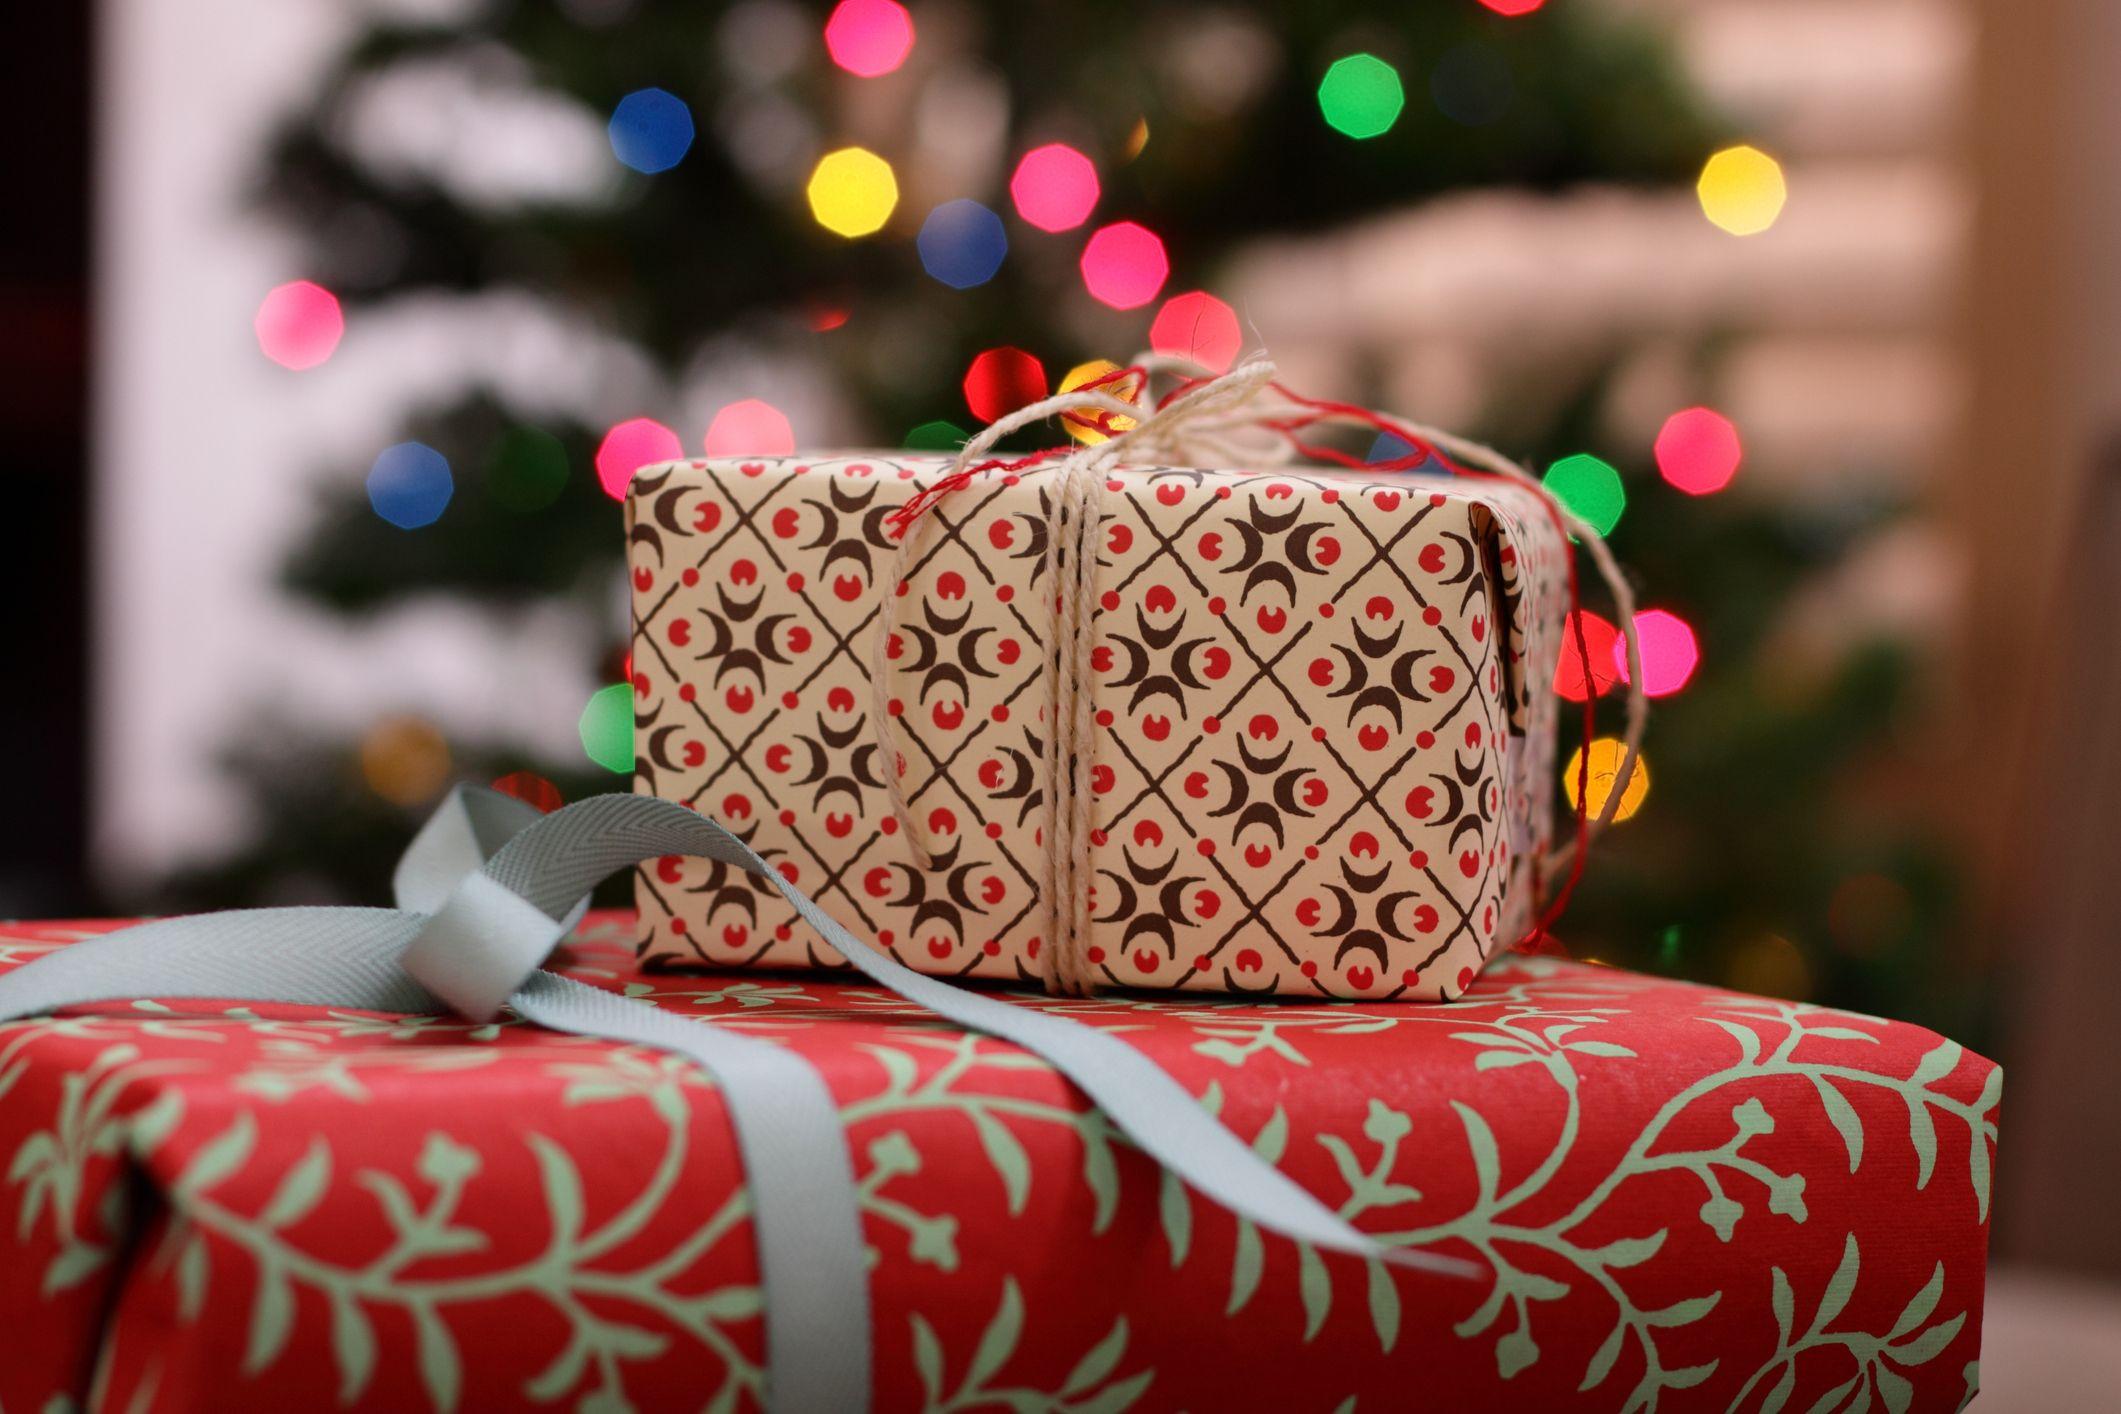 7 ways to save money this Christmas